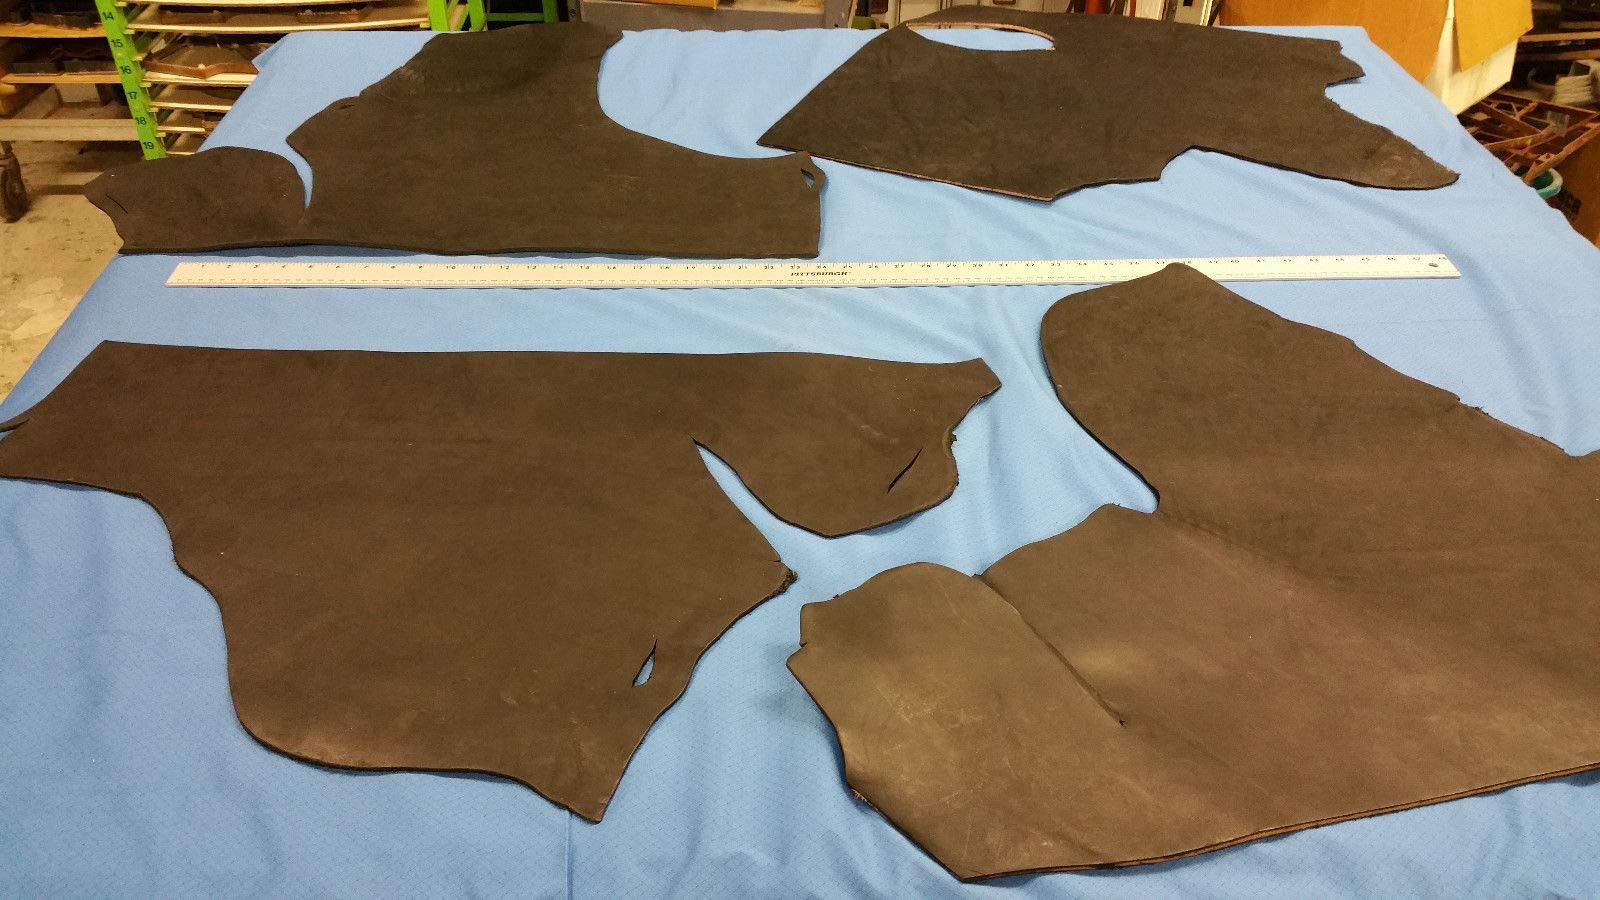 Veg-Tann/Harness/Bridle Full Grain Leather Black, Bundle #9/10 oz +